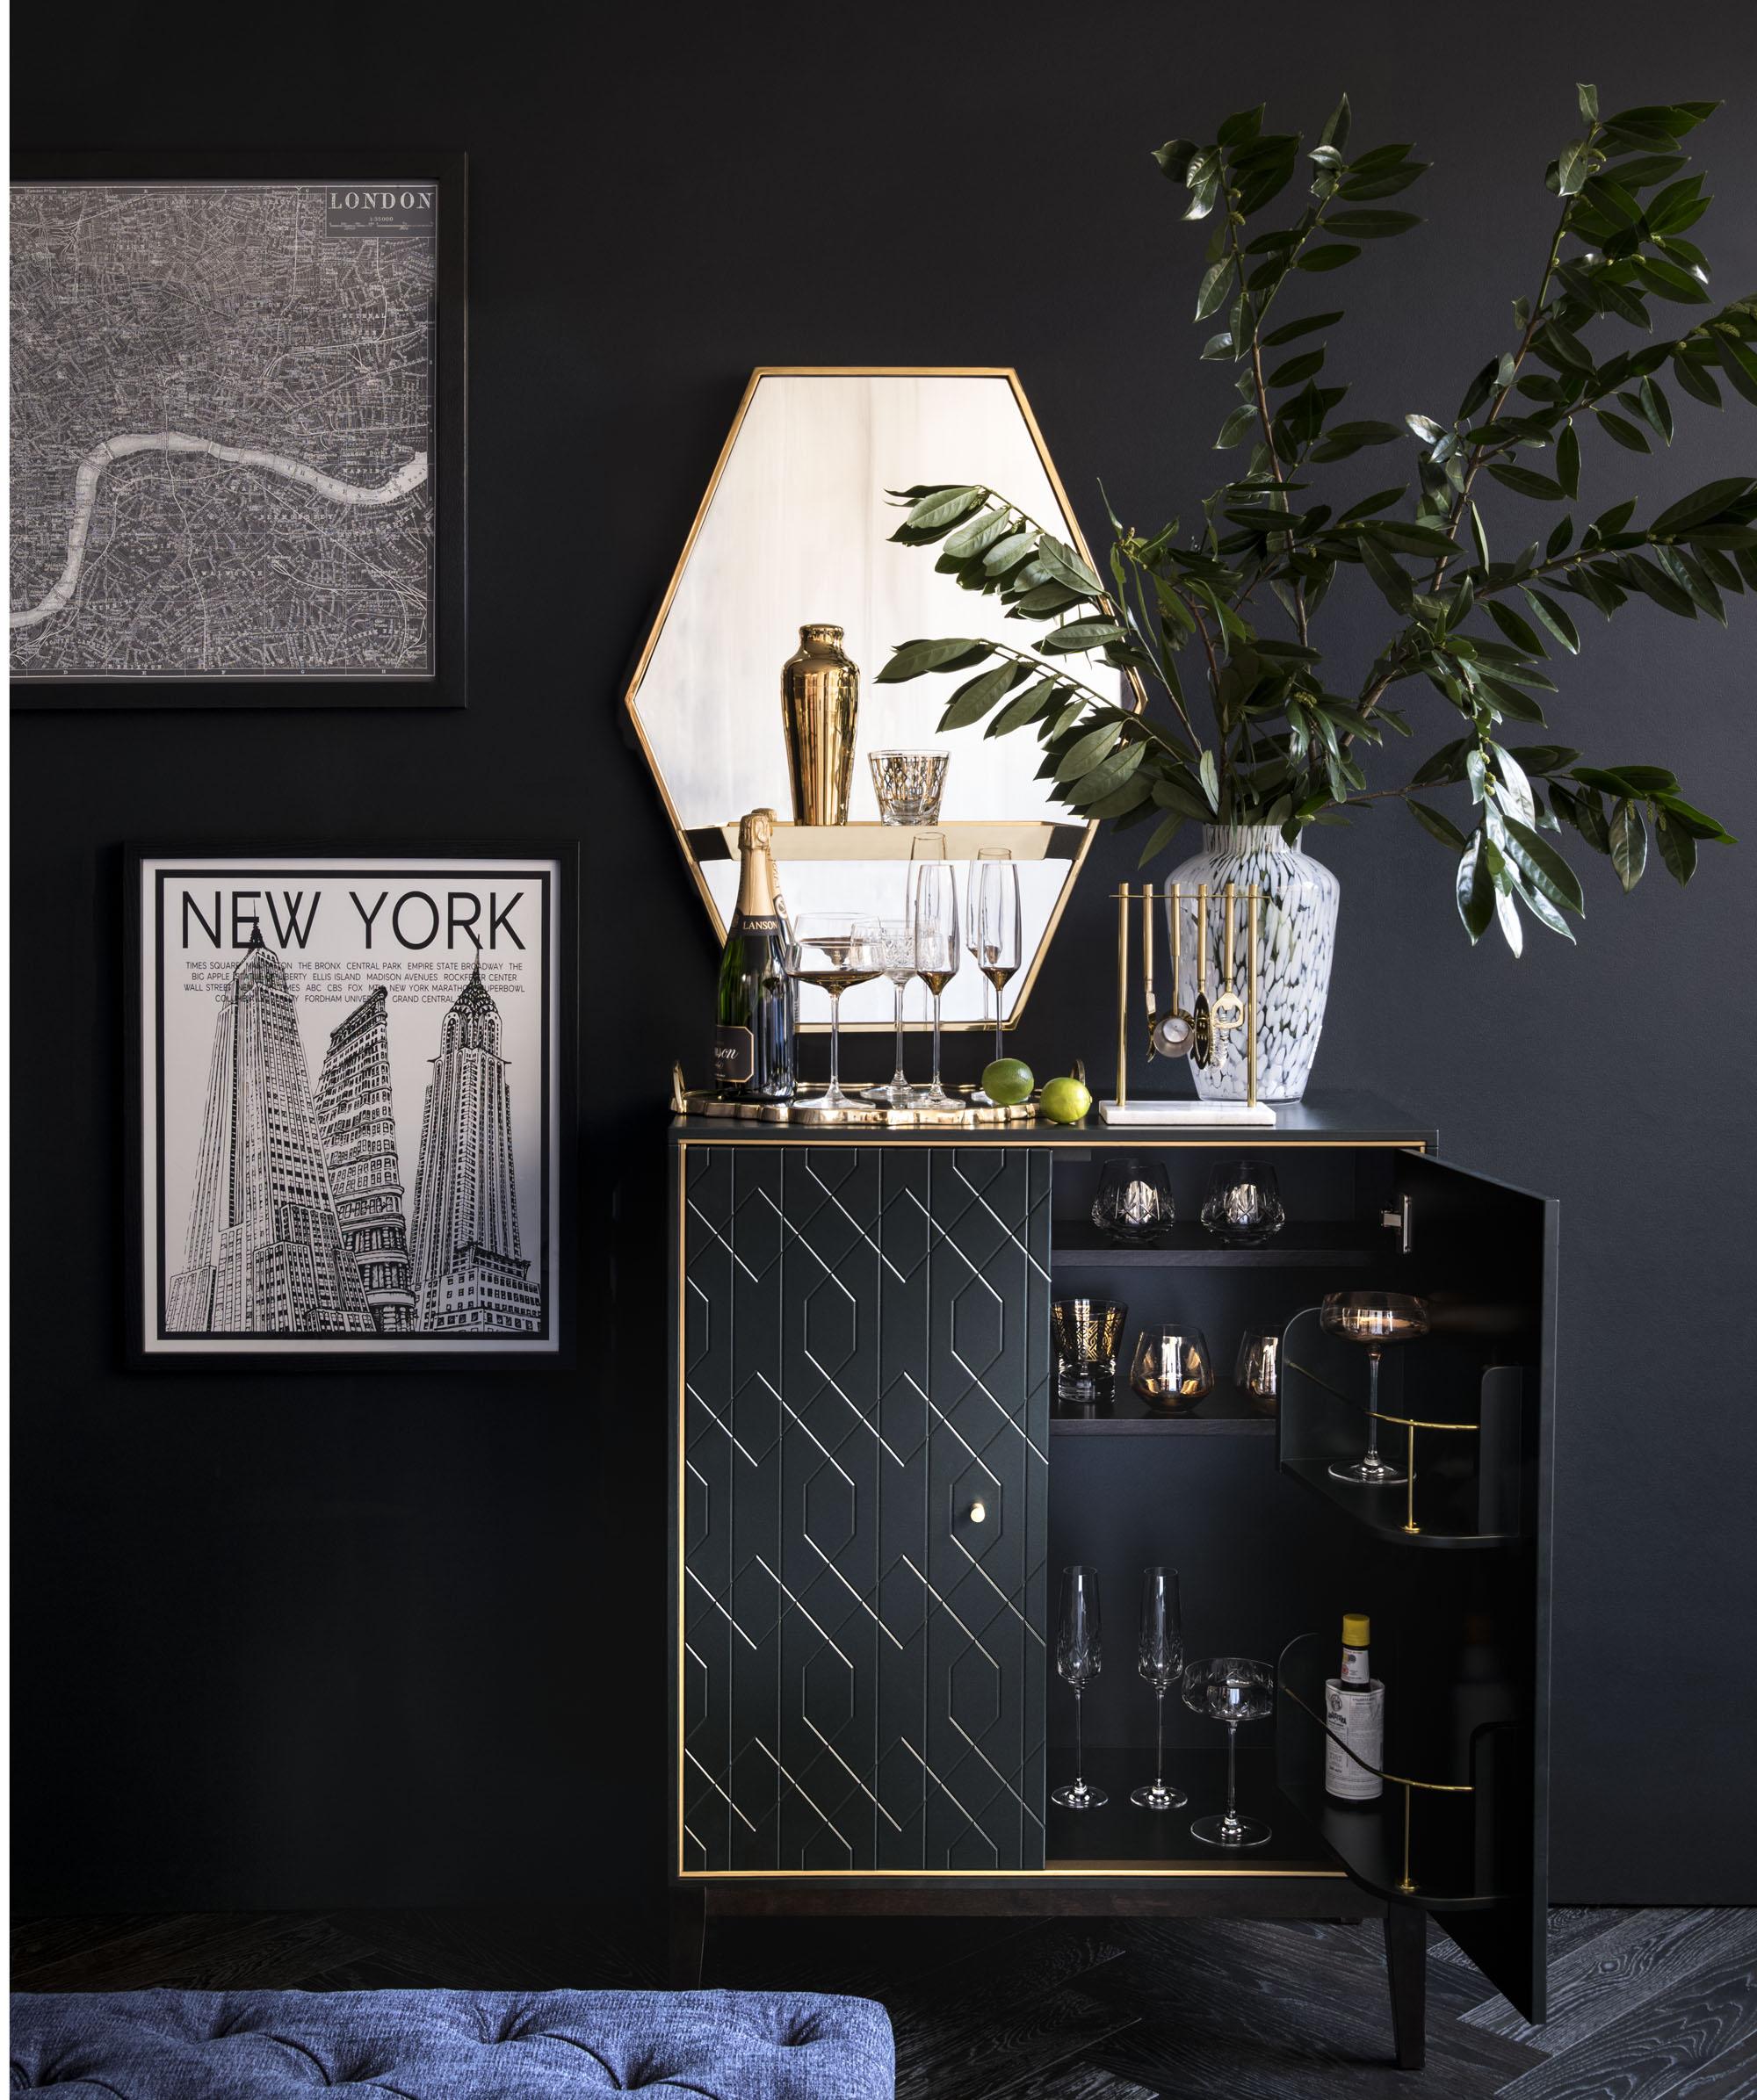 Art Nouveau interior design with style, decor and colors